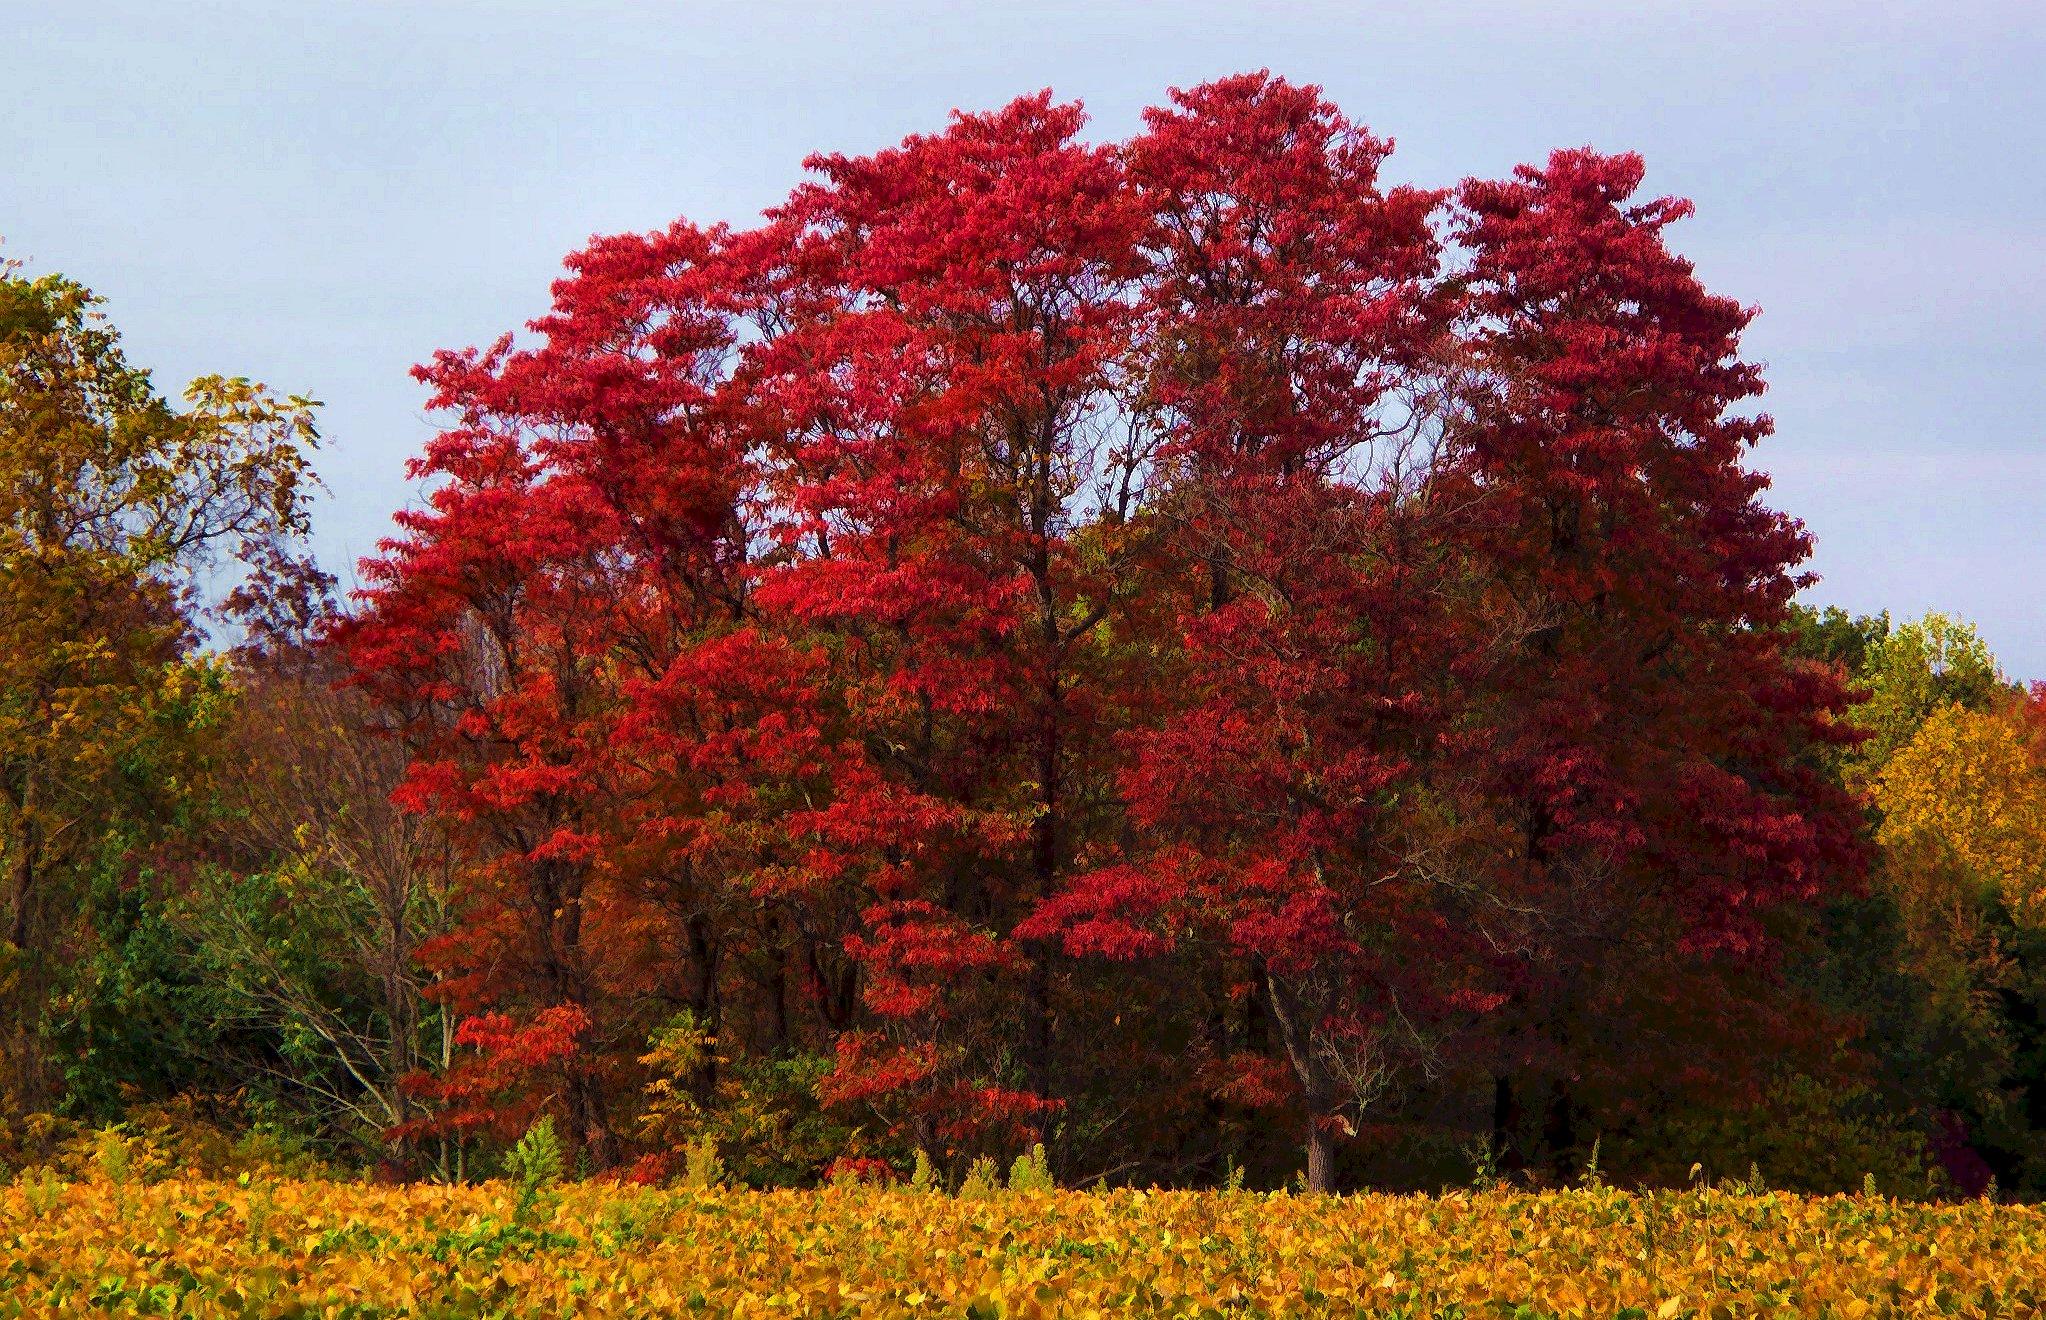 red sassafras trees – Under the Sun and Under the Moon: https://wildwanderingirl.wordpress.com/2013/10/17/sassafras-trees...